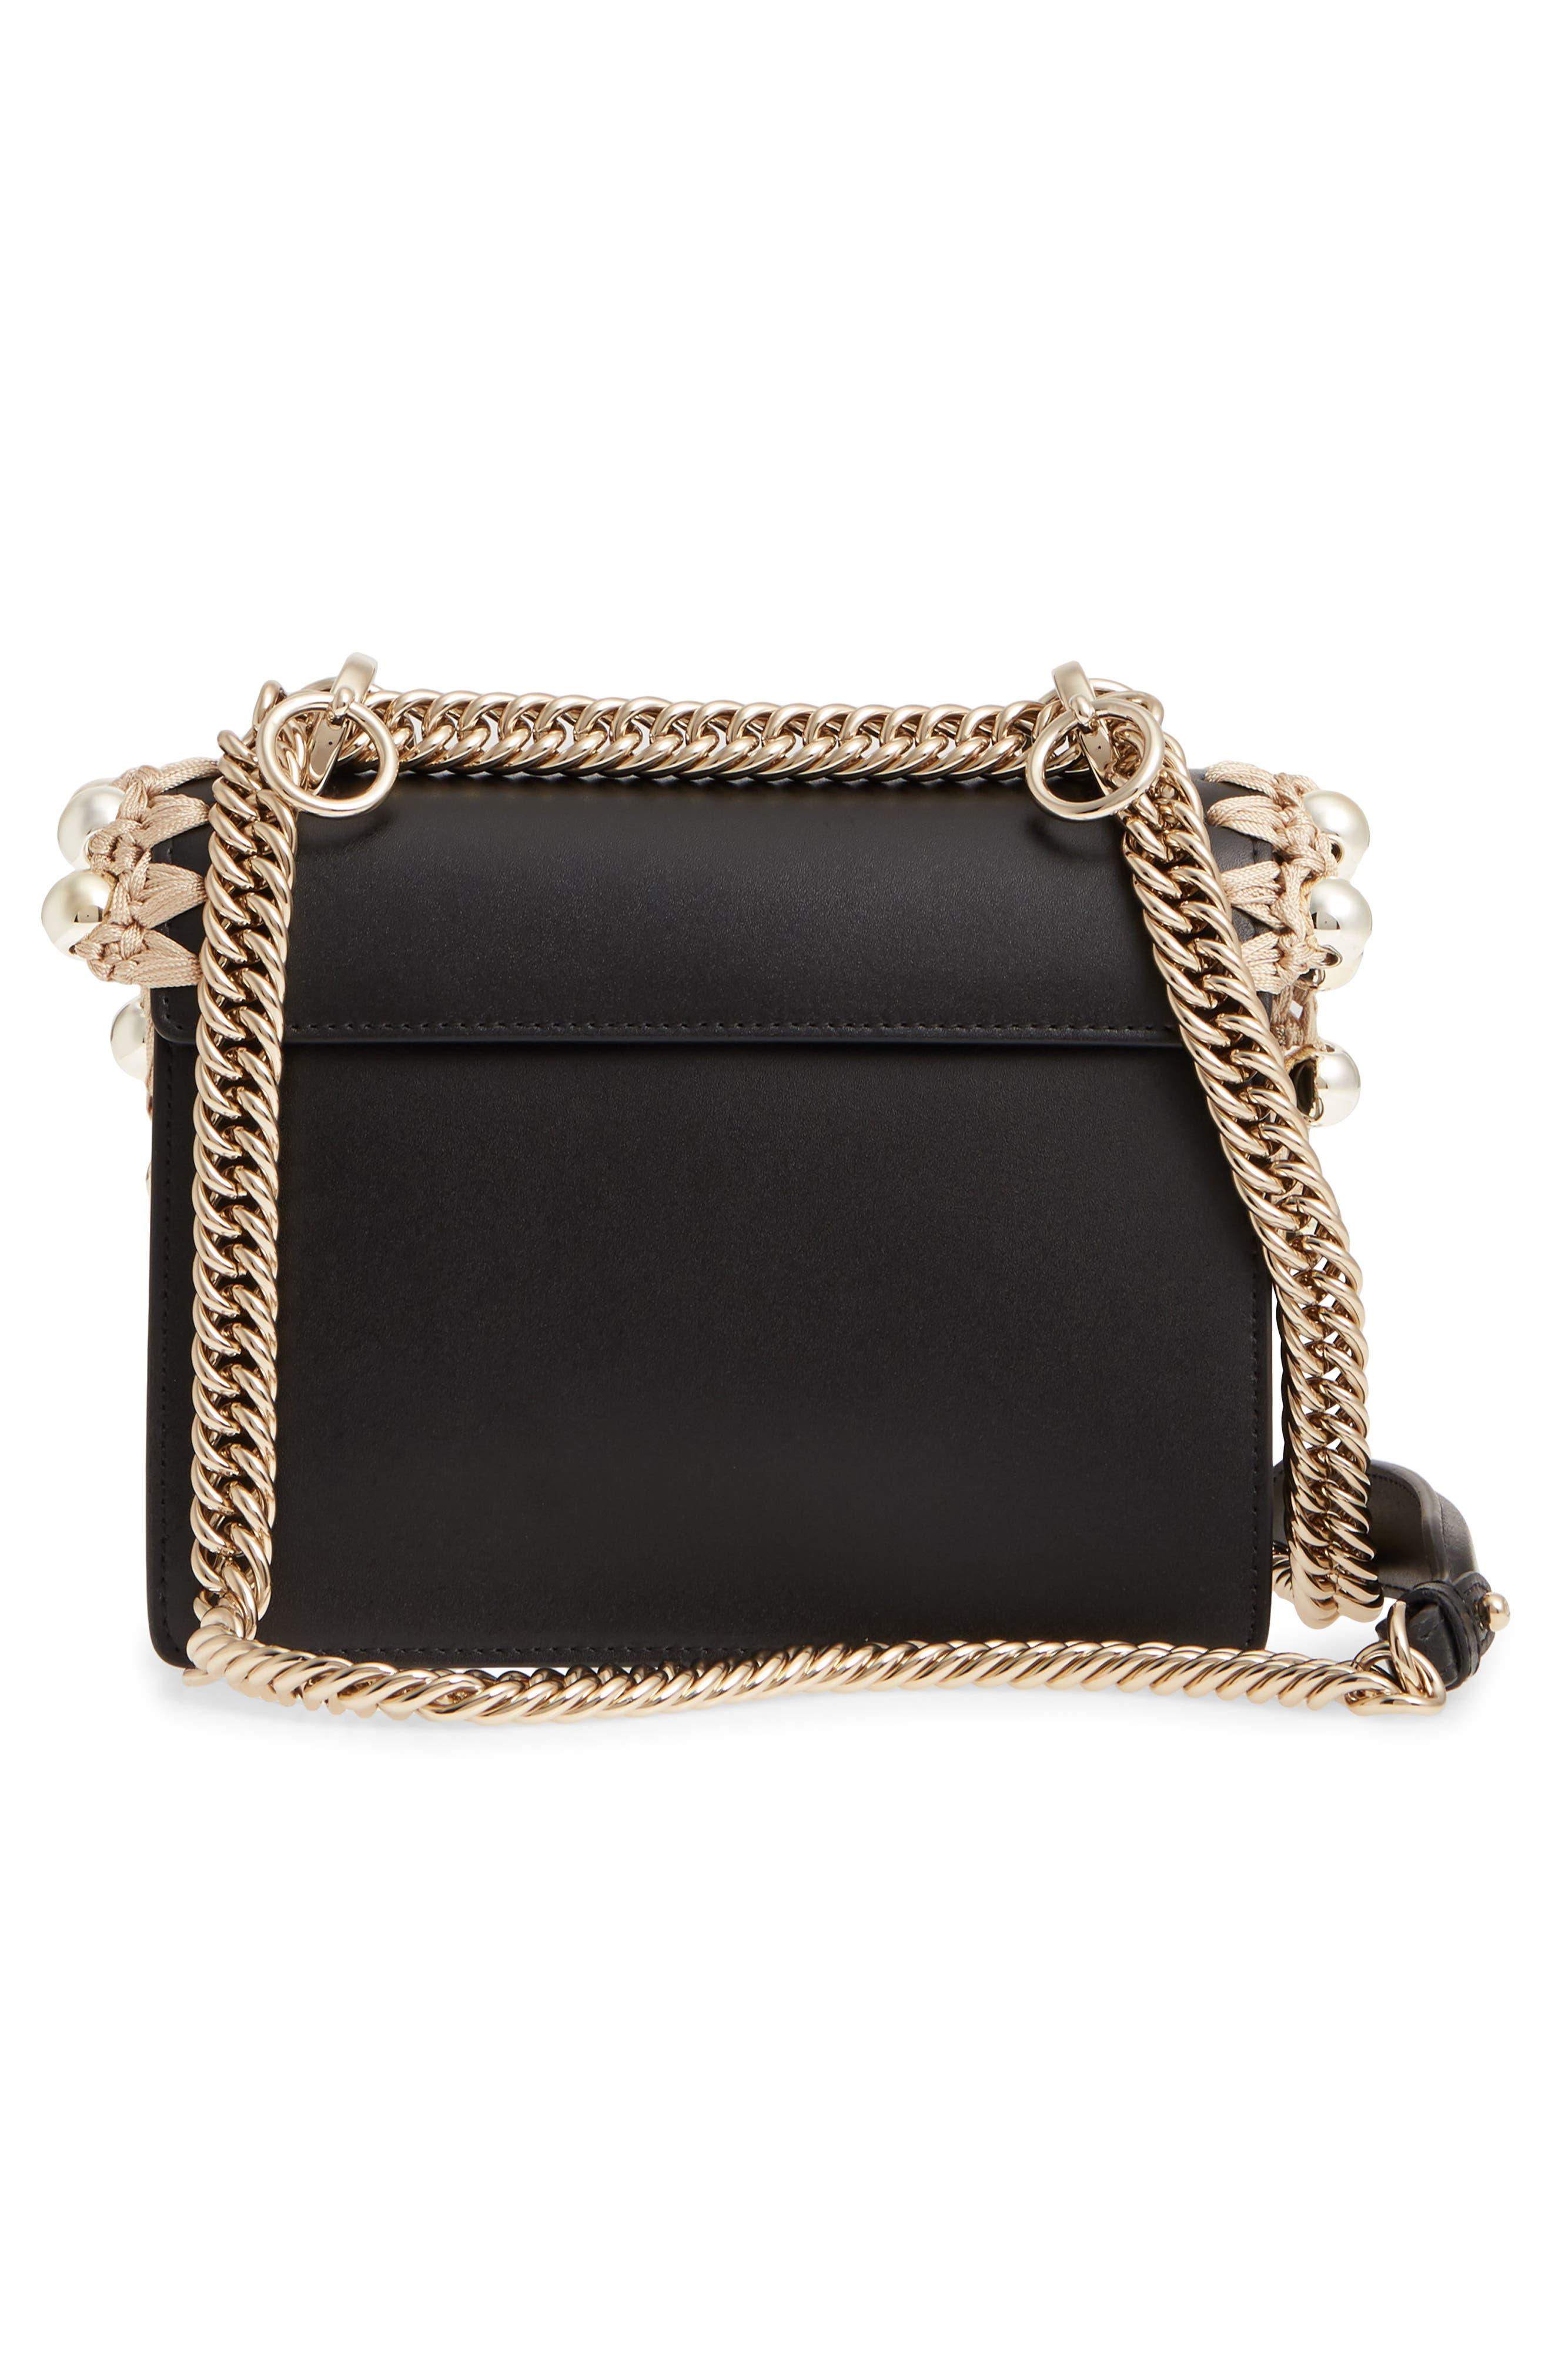 Small Kan I Leather Shoulder Bag,                             Alternate thumbnail 3, color,                             NERO/ ORO/ CHIARO